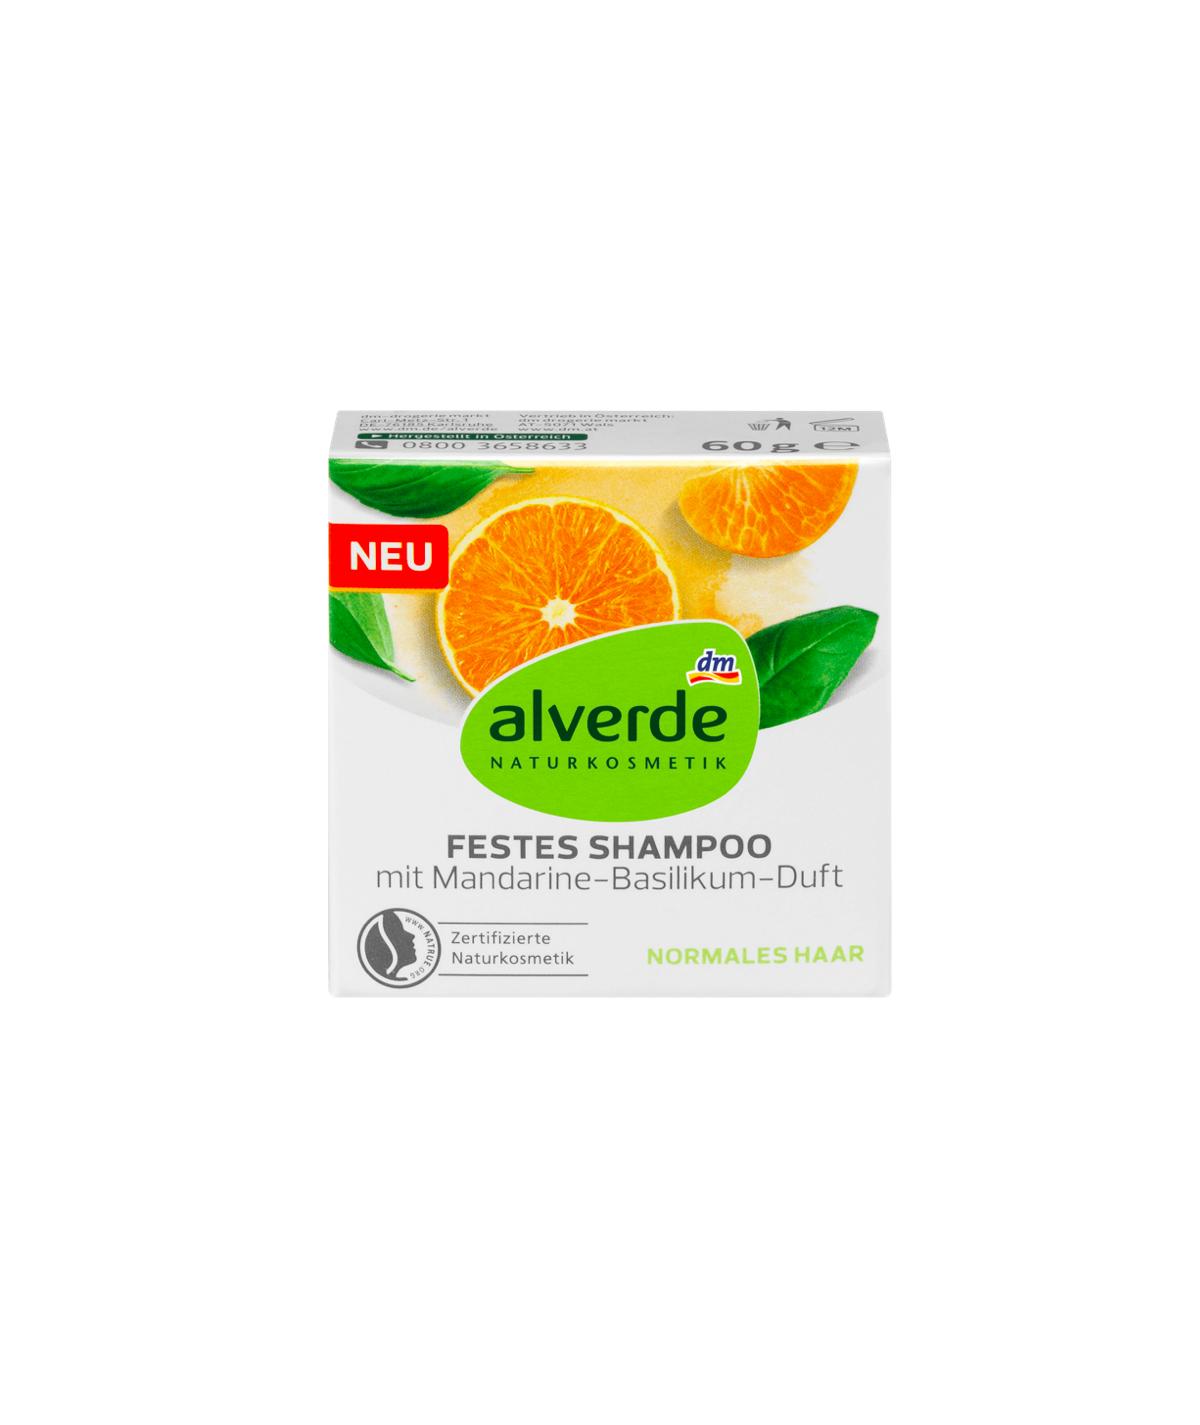 shampoing solide au parfum mandarine et basilic, 60 g